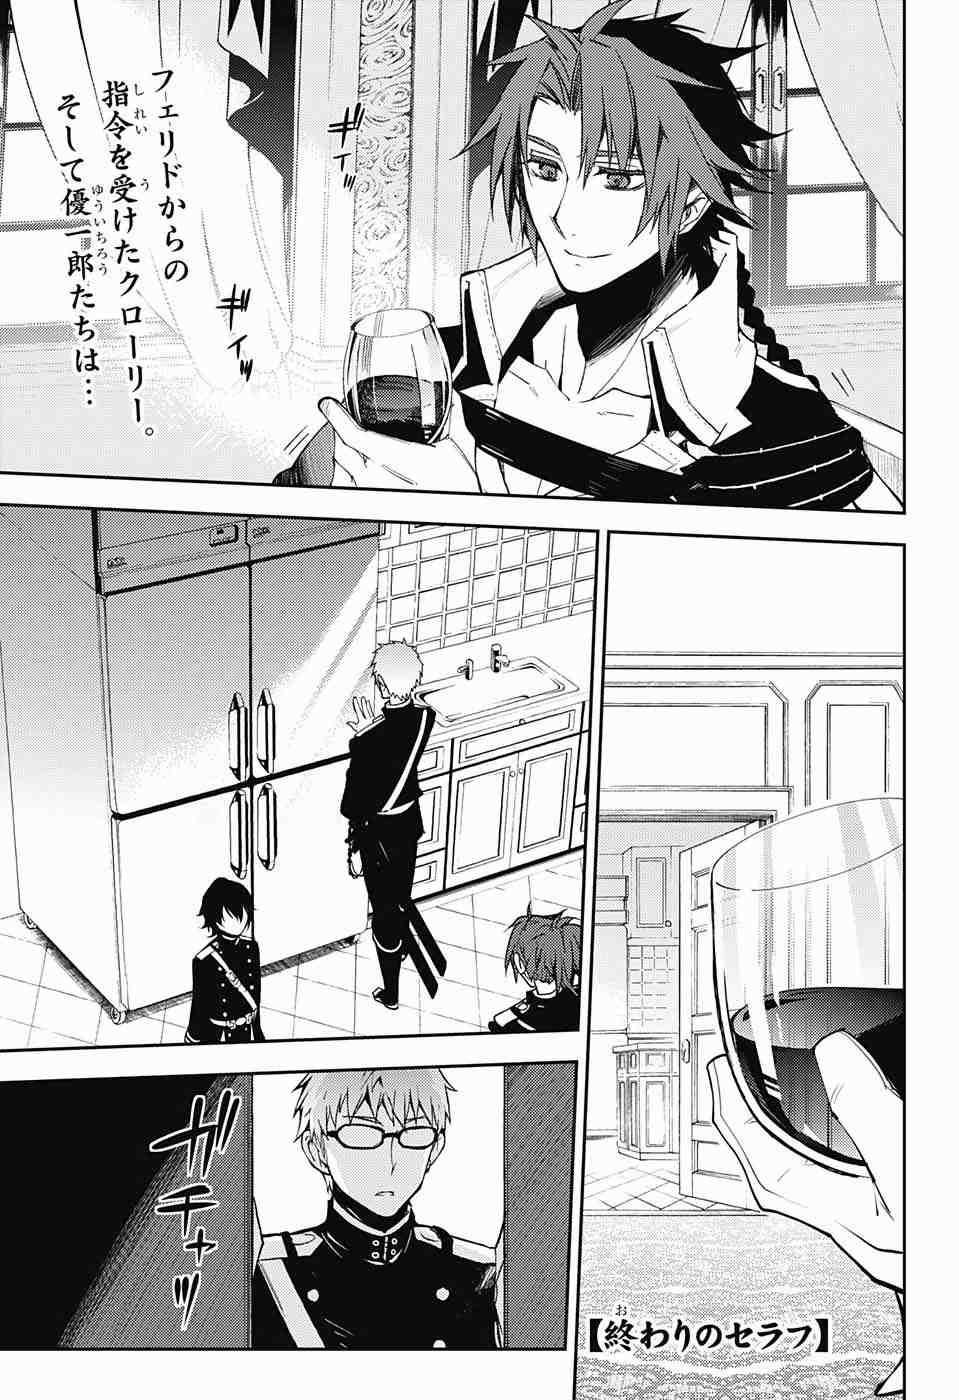 Owari no Seraph - Chapter 54 - Page 1